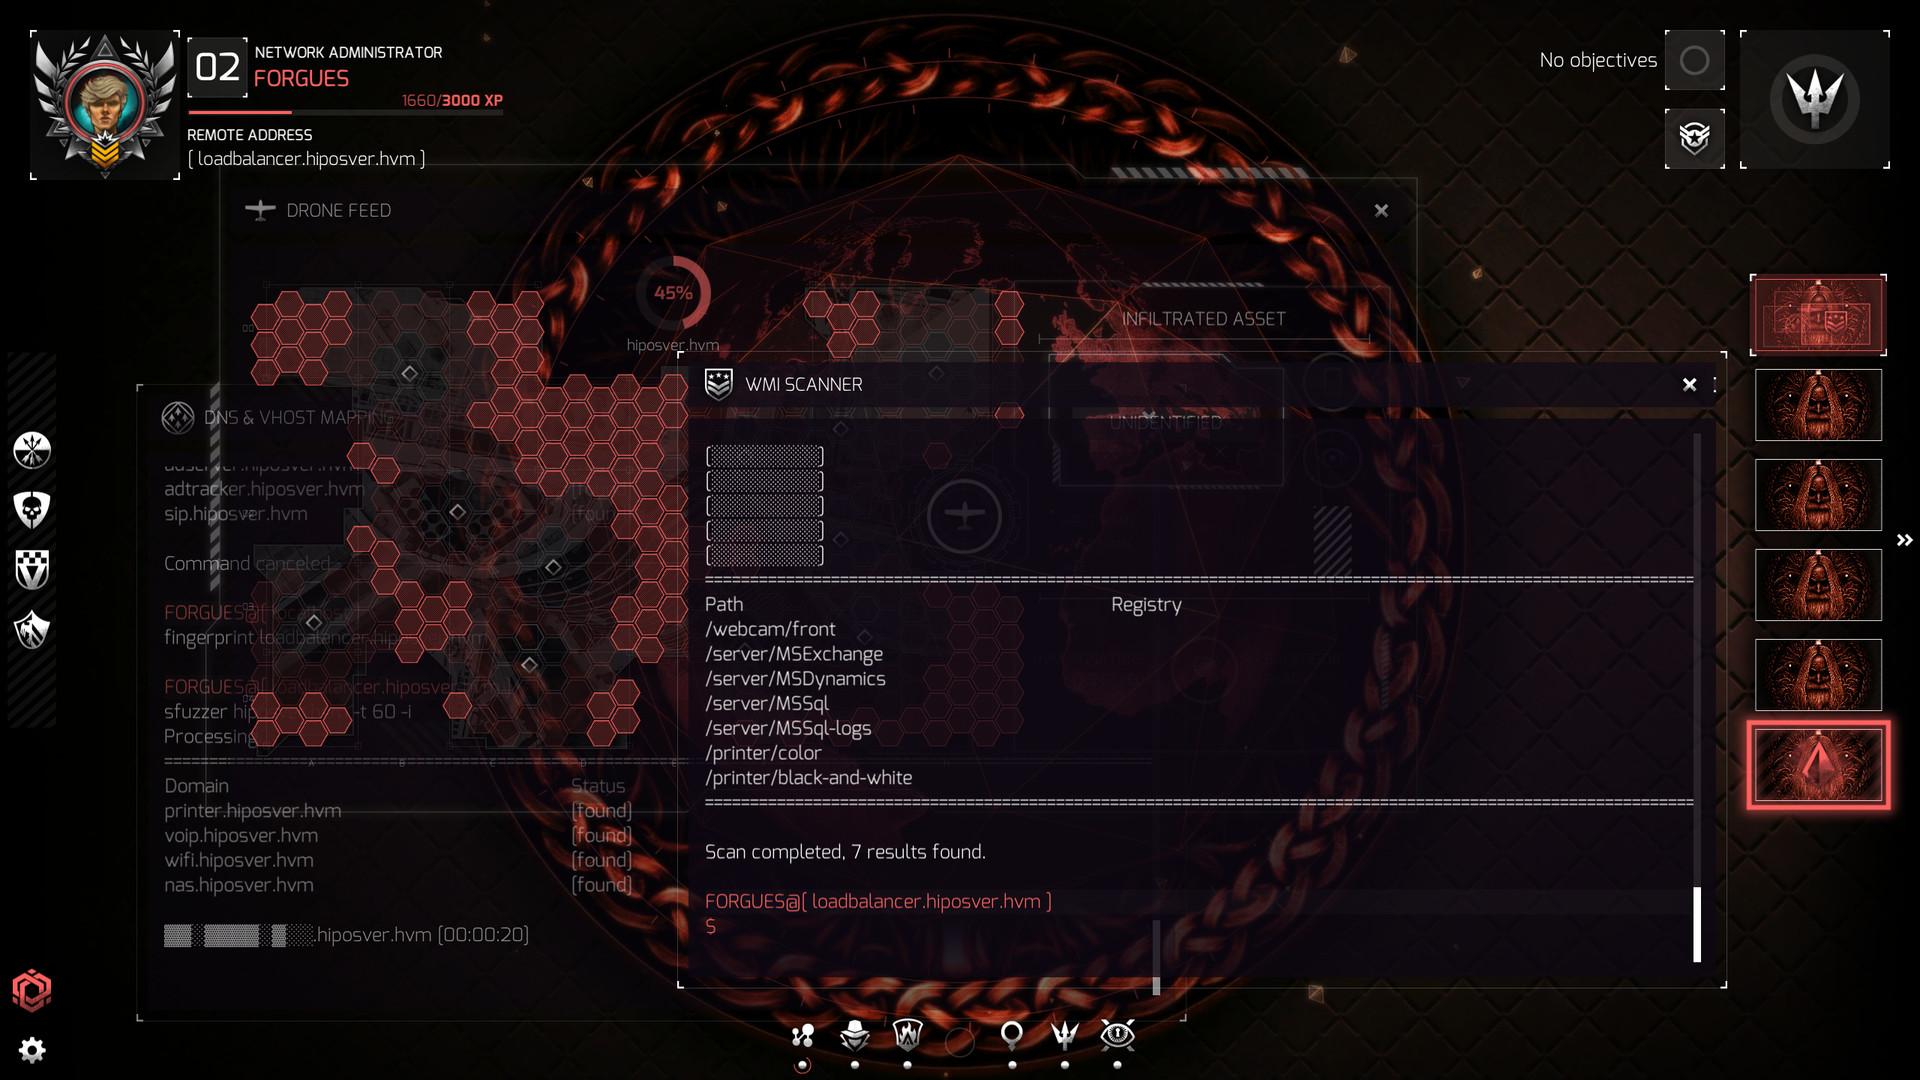 Nite Team 4 Network Administrator On Steam